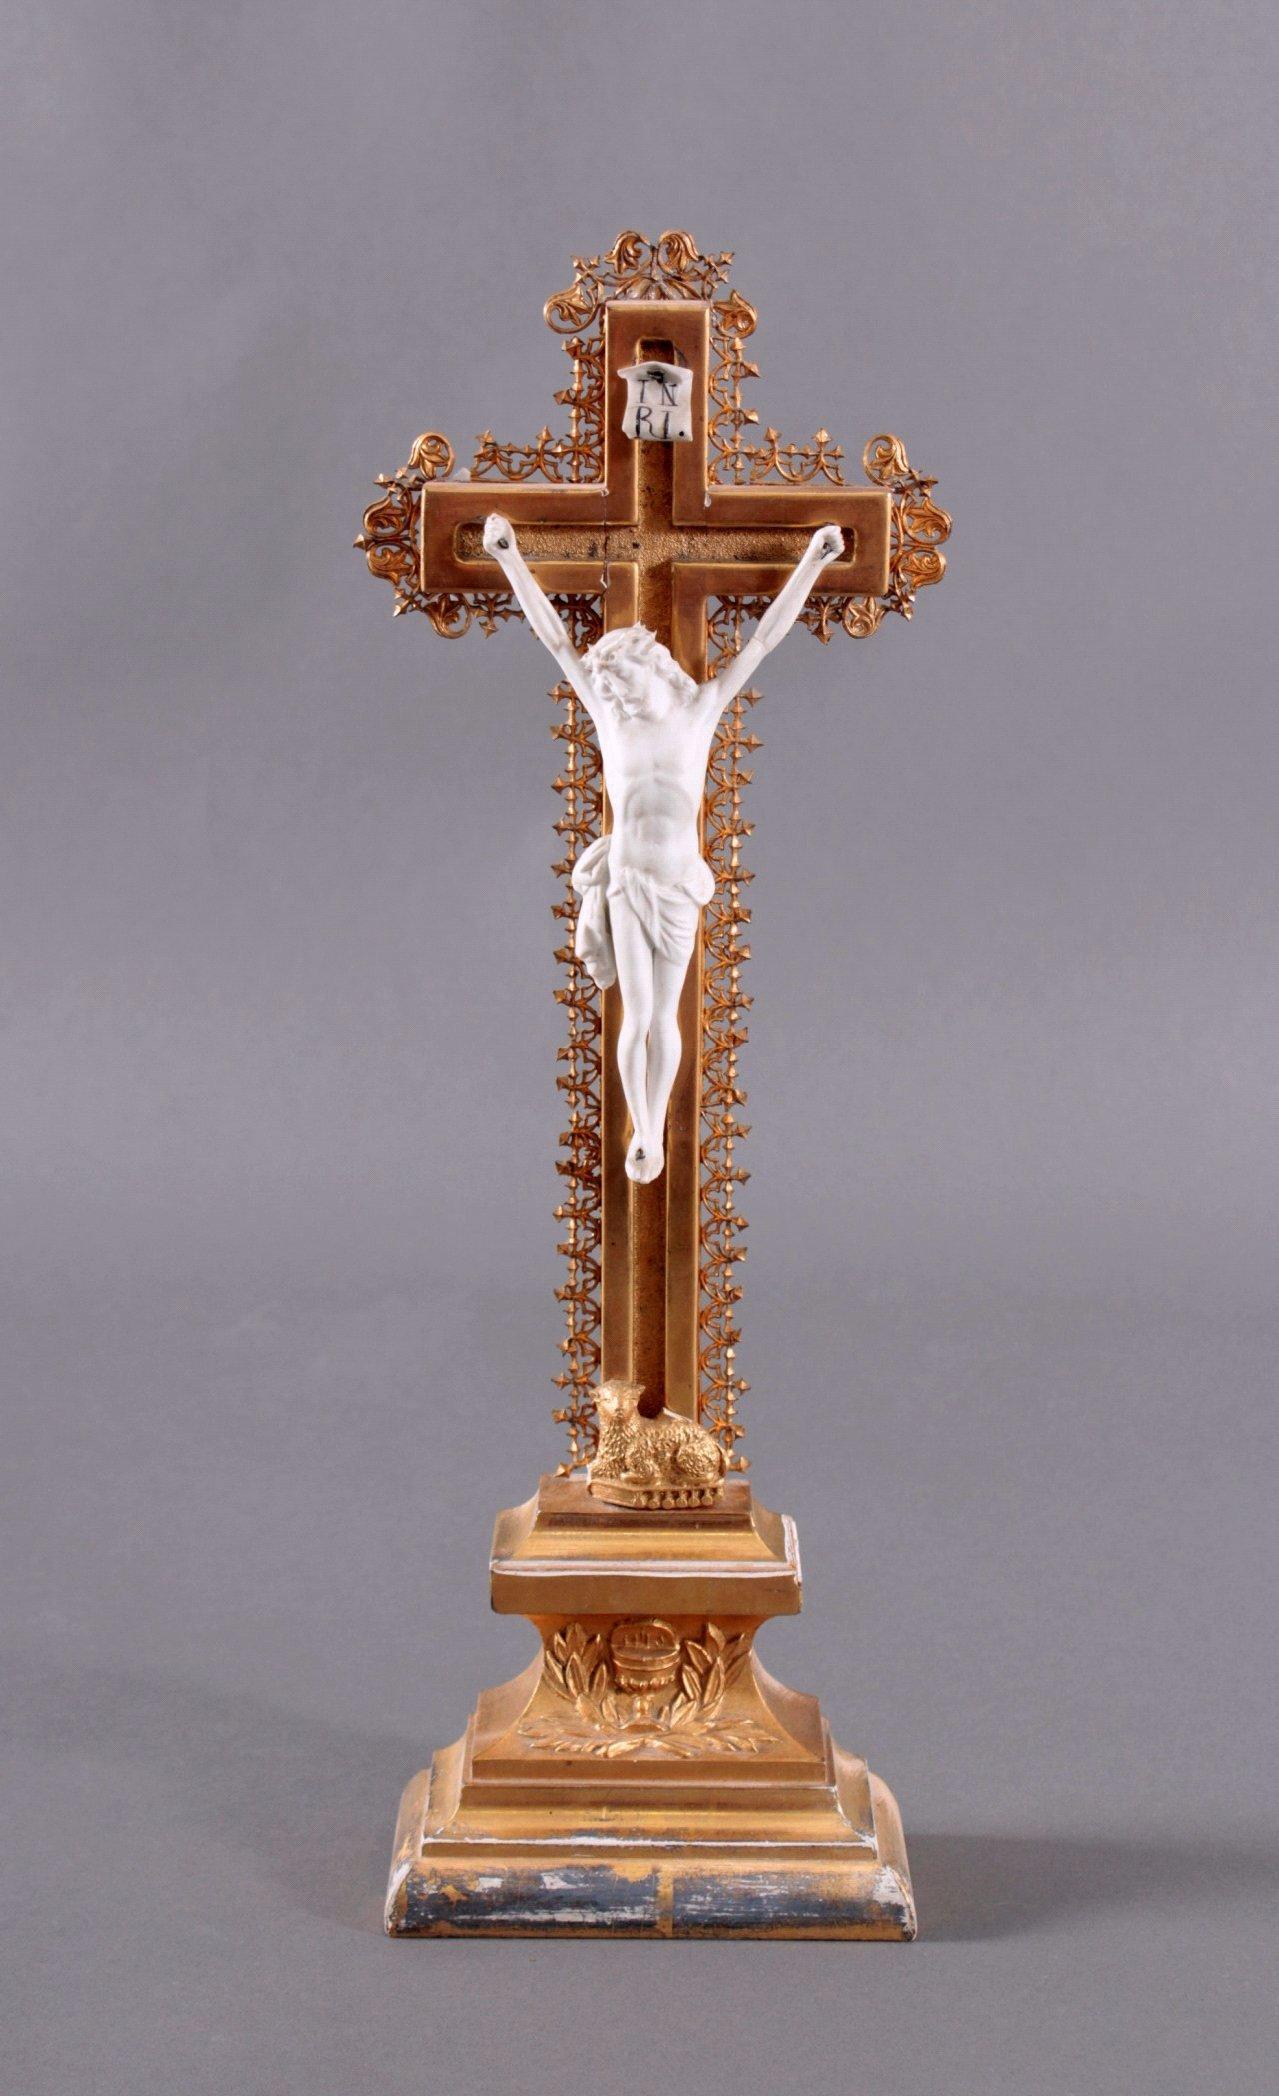 Standkreuz, 19. Jahrhundert